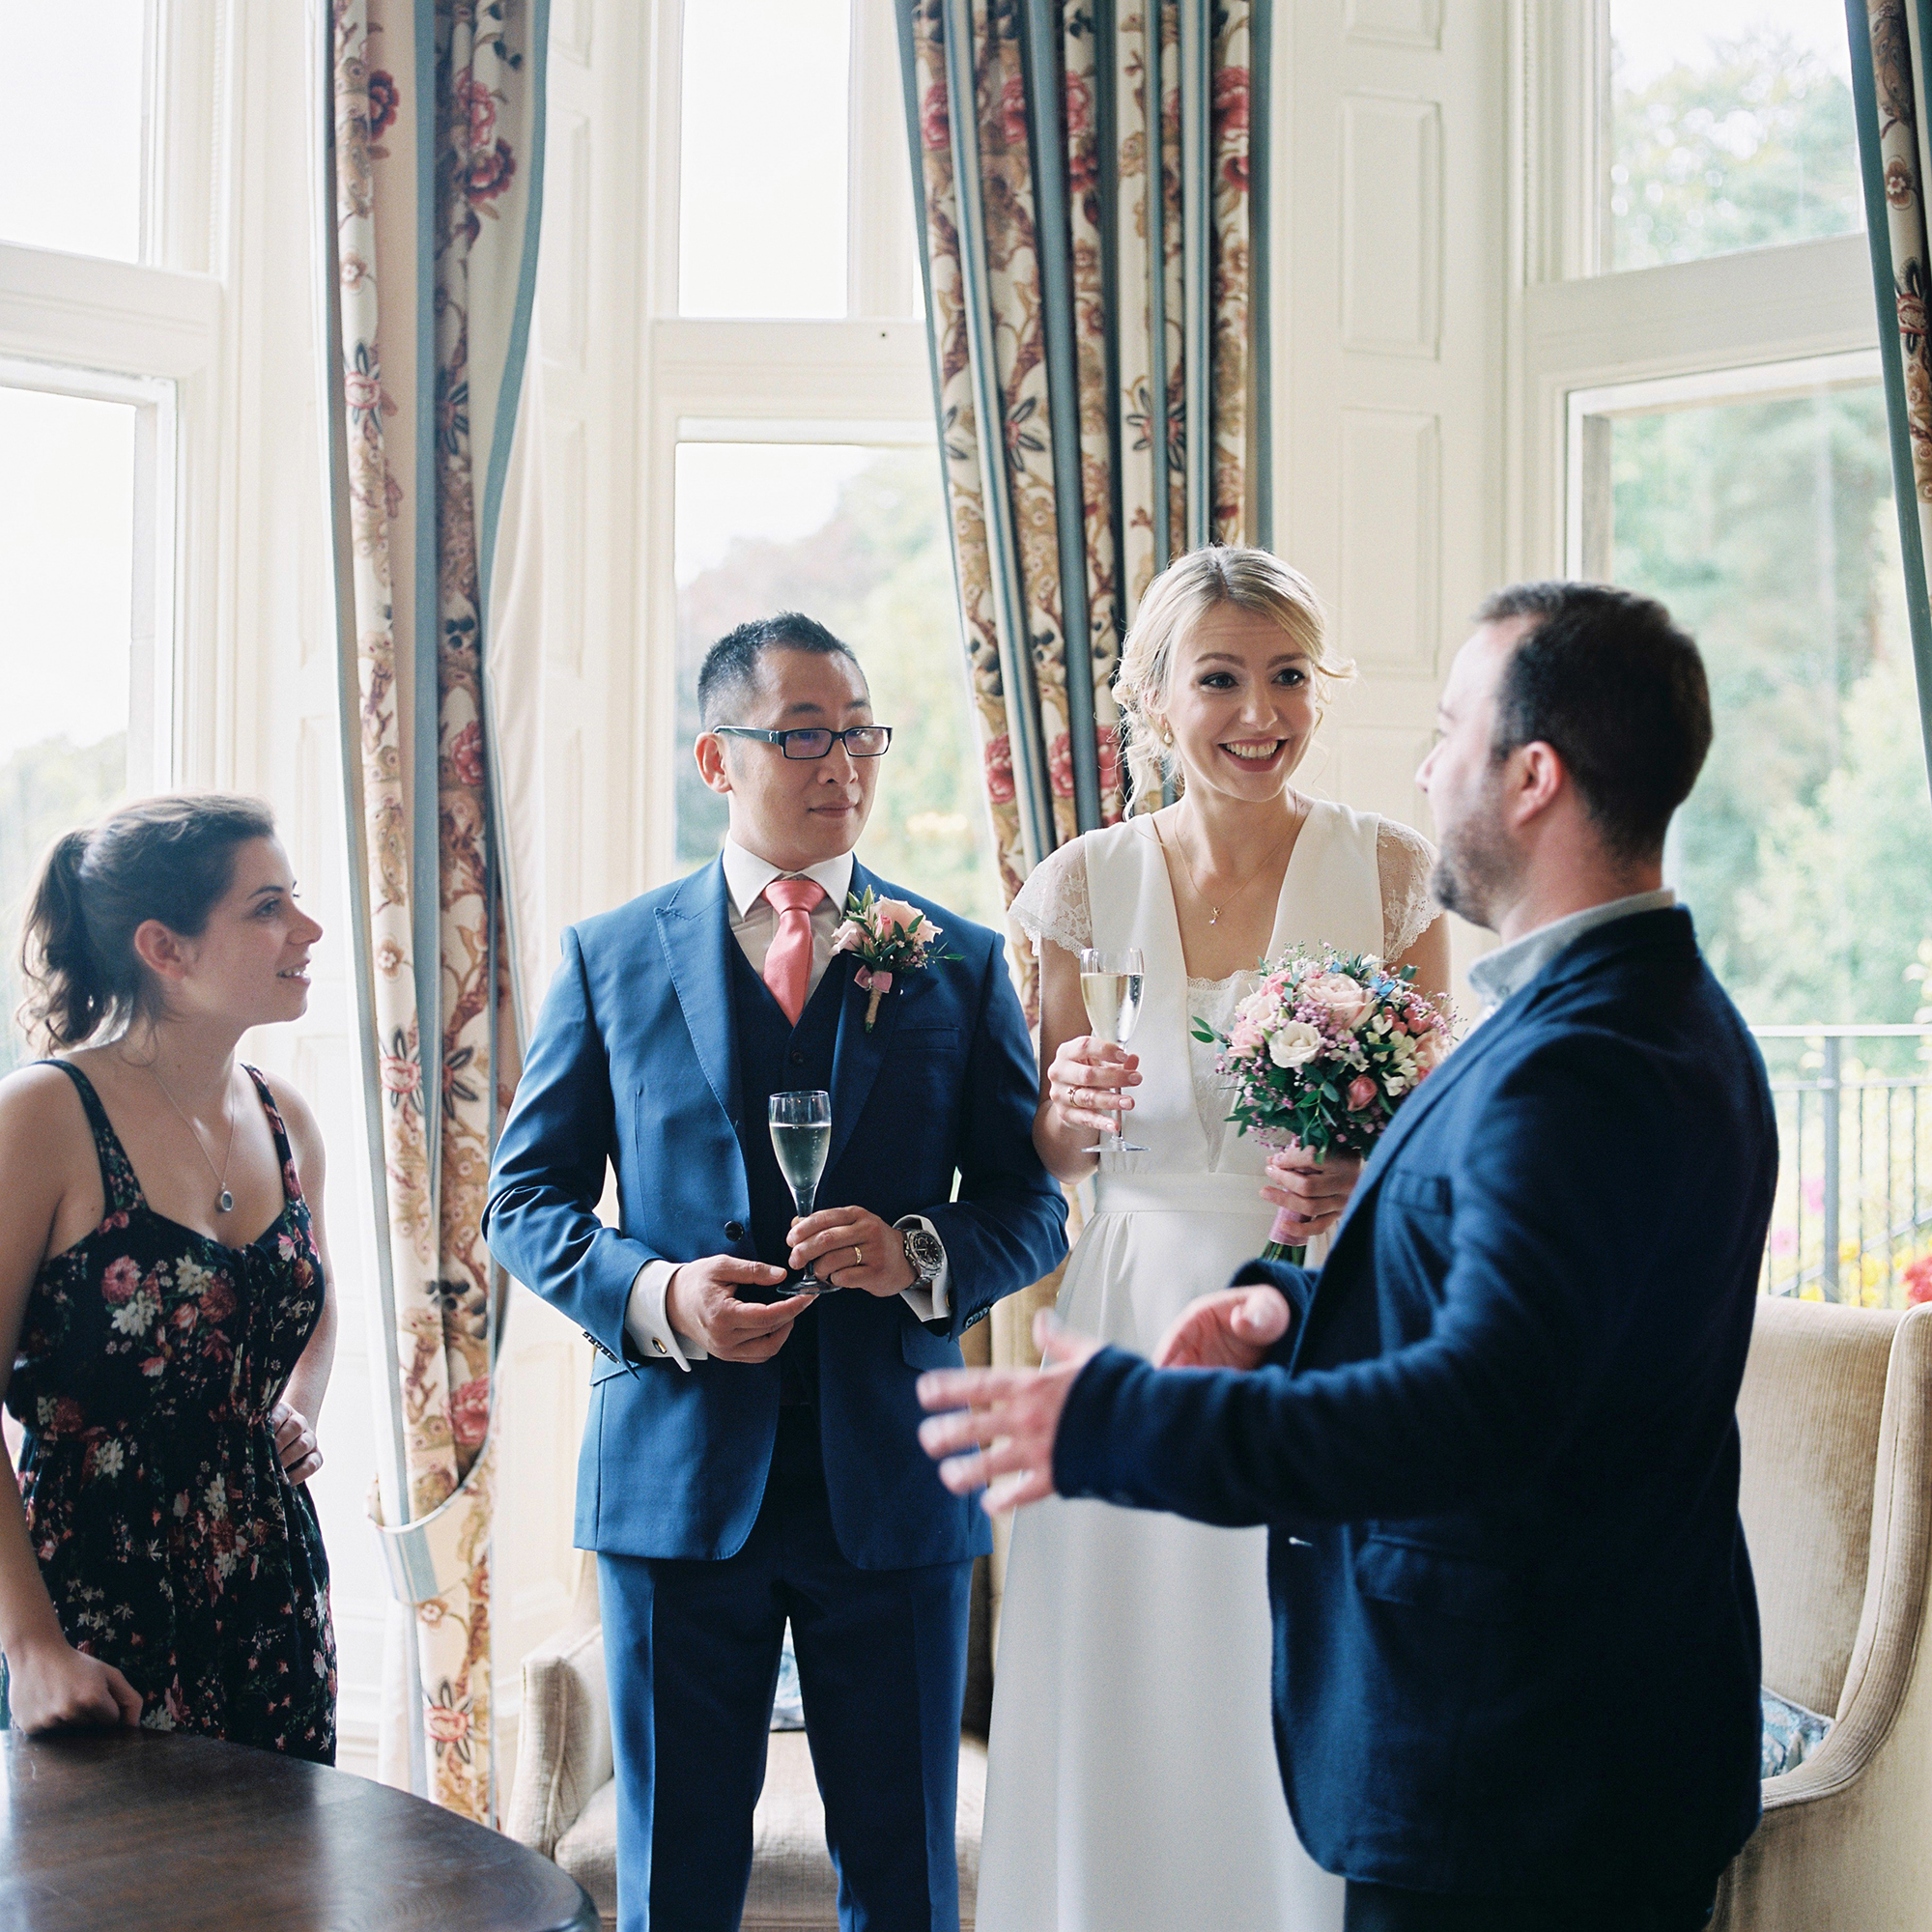 wedding_photographer_cumbria221.jpg